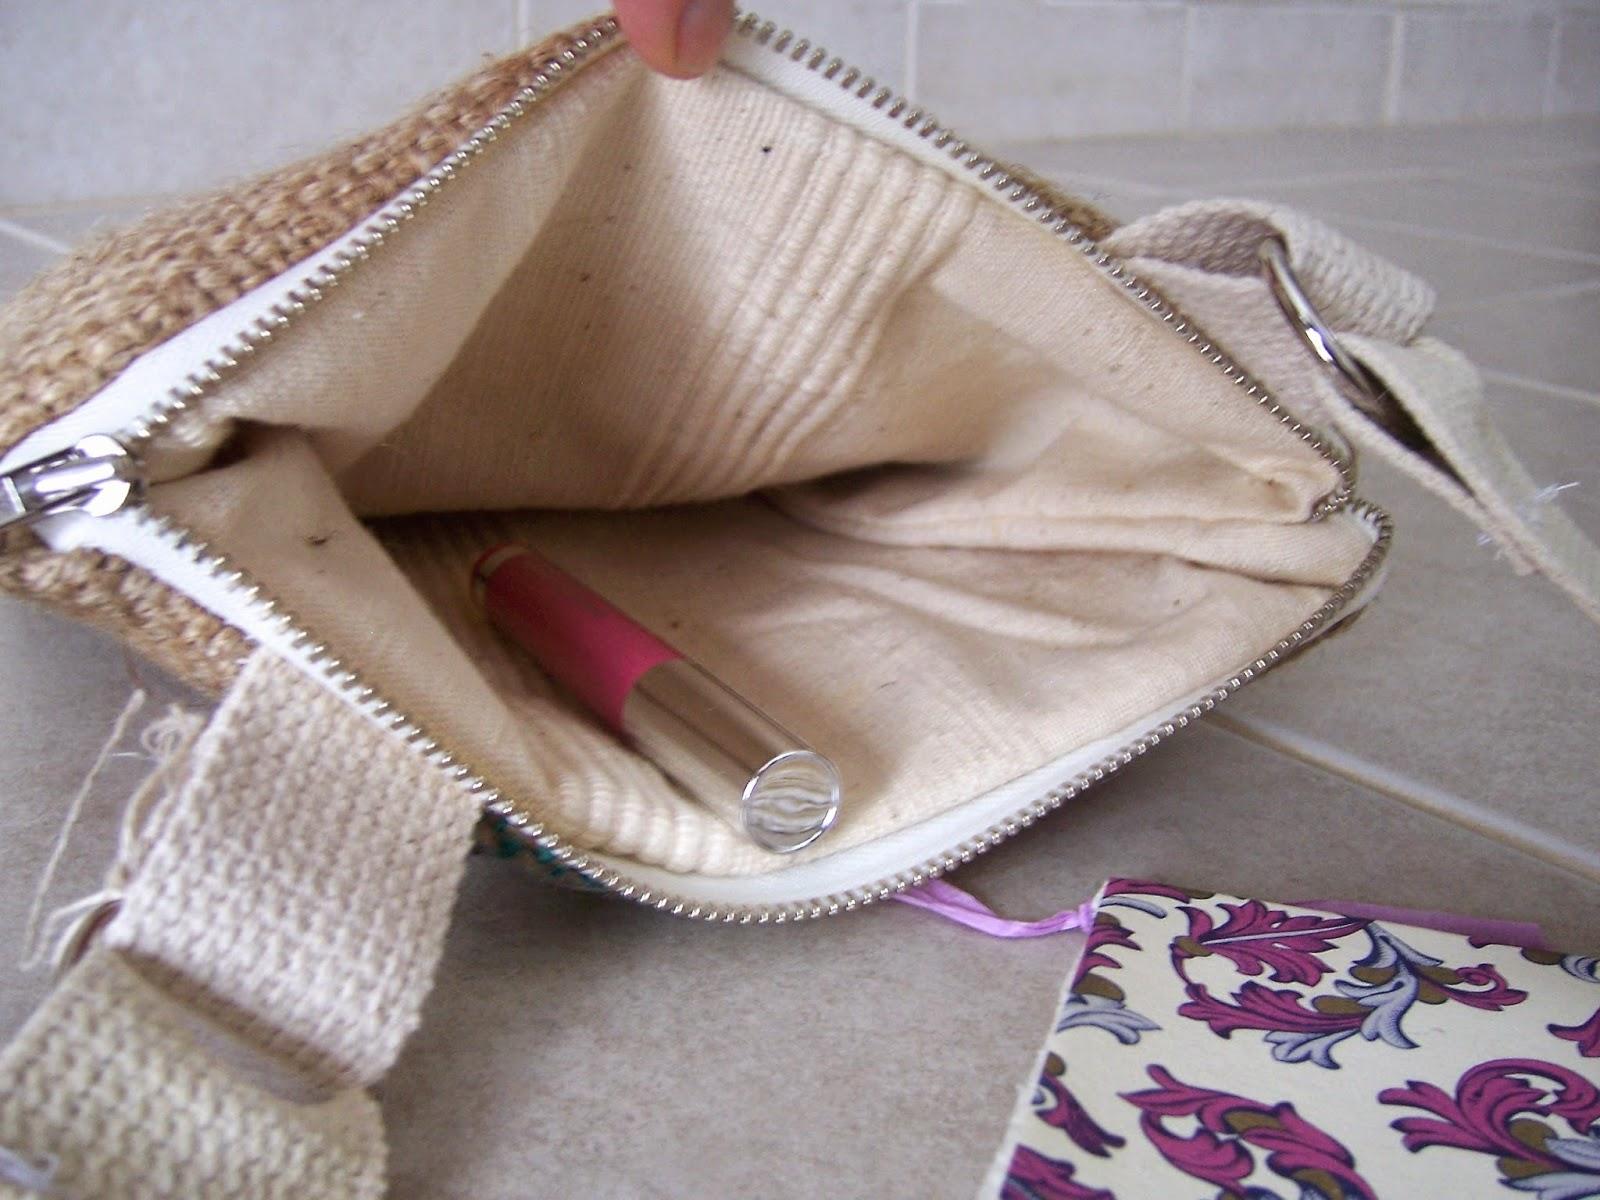 Jute Mills burlap bag inside - linaandvi.blogspot.com - Plymouth MI